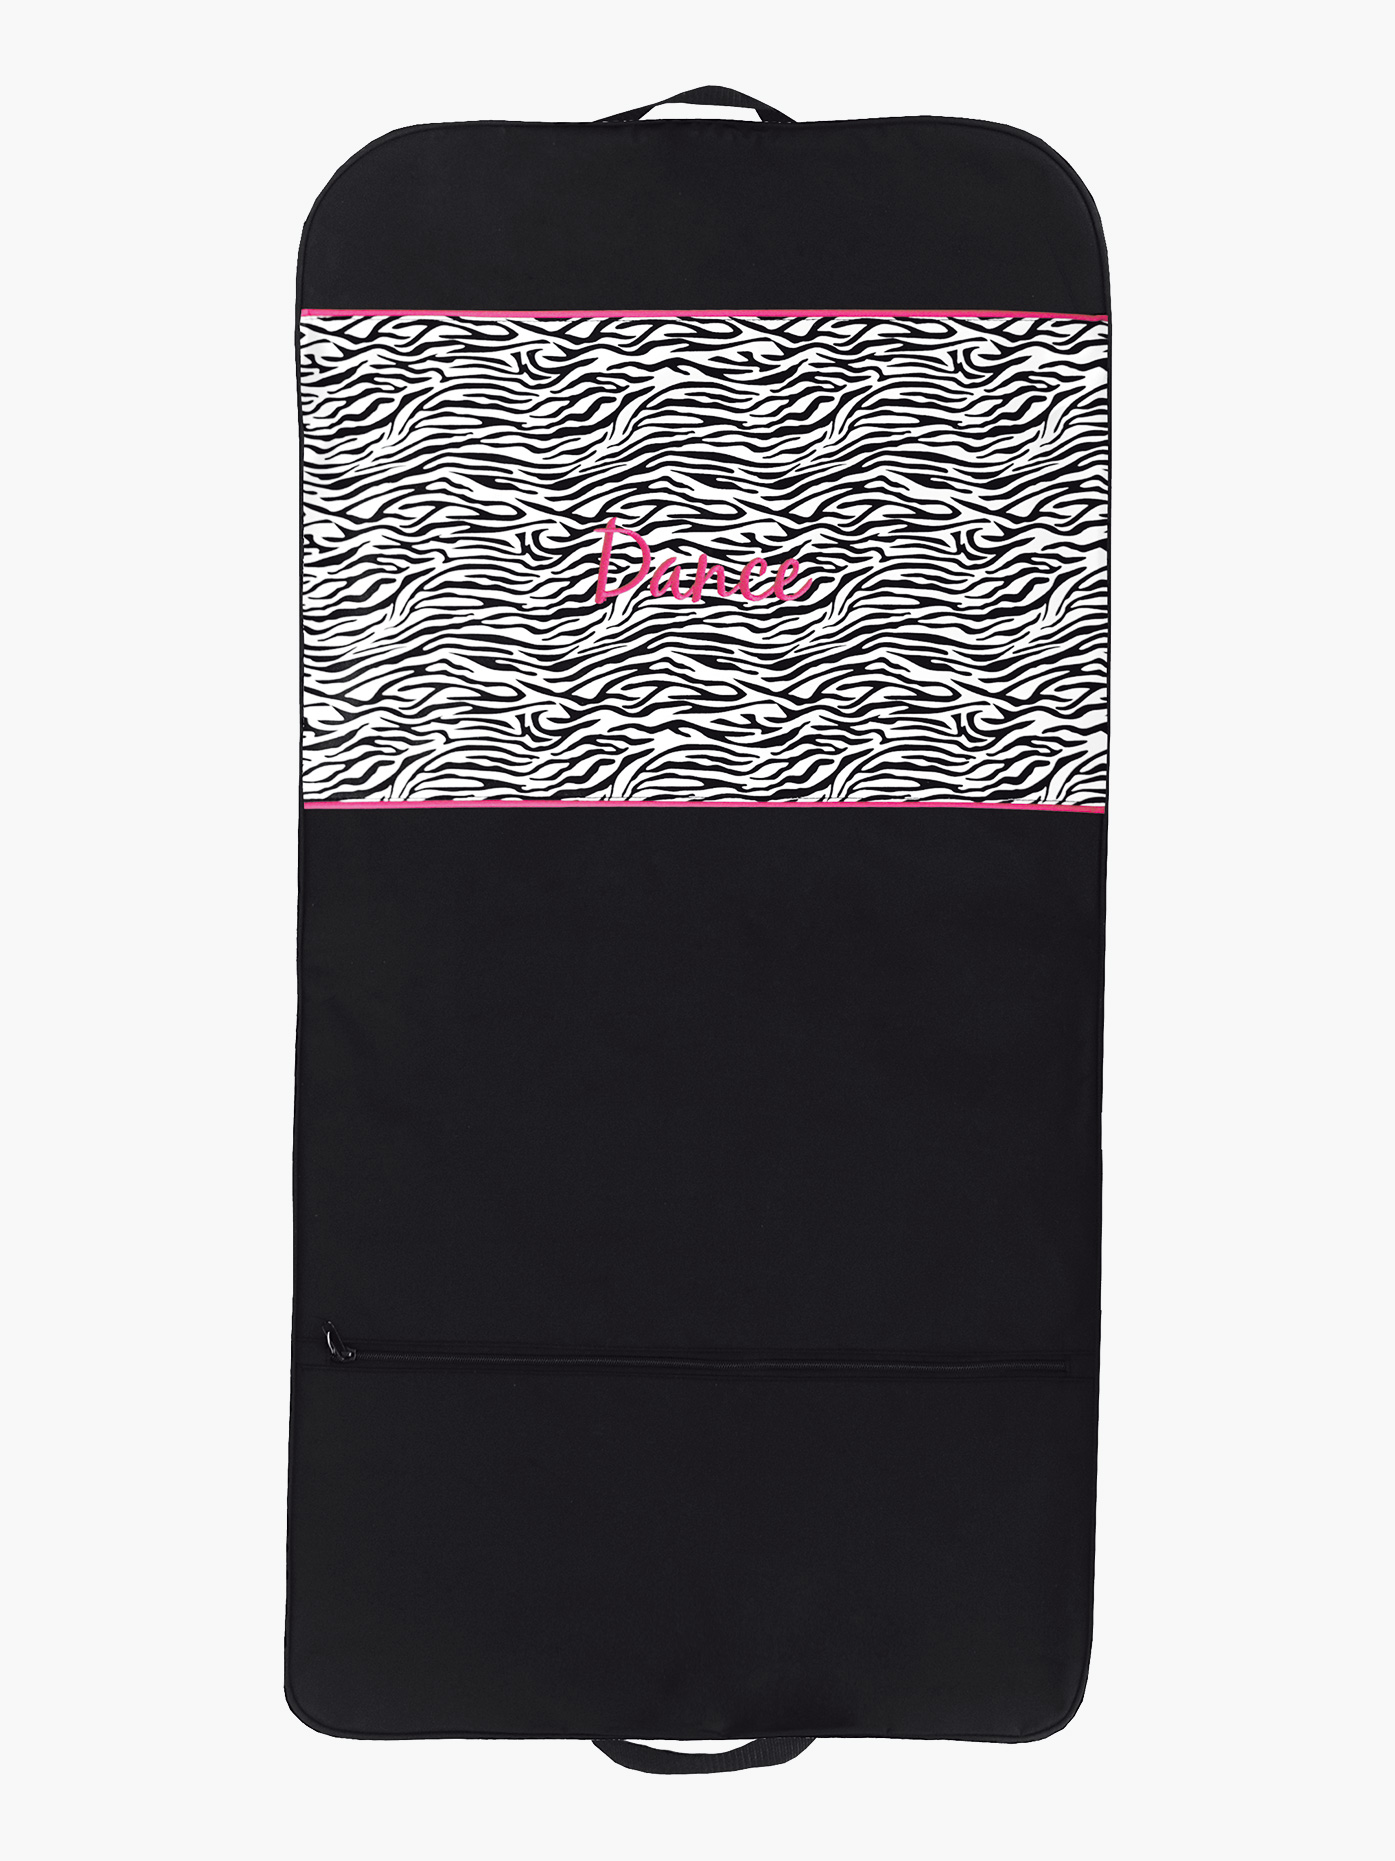 Sassi Zebra Garment Bag ZBR04